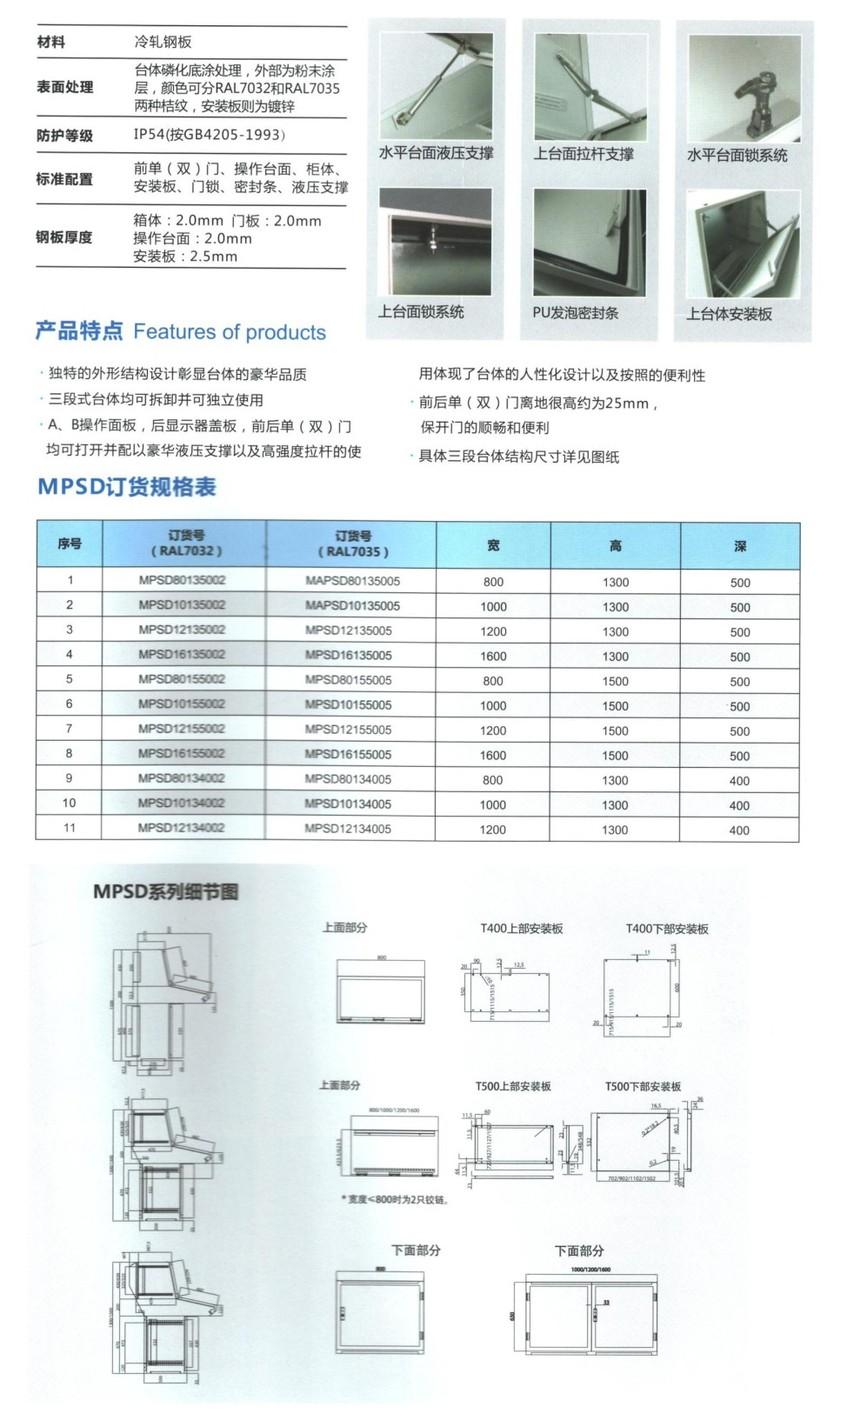 MPSD三段式操作台01.jpg